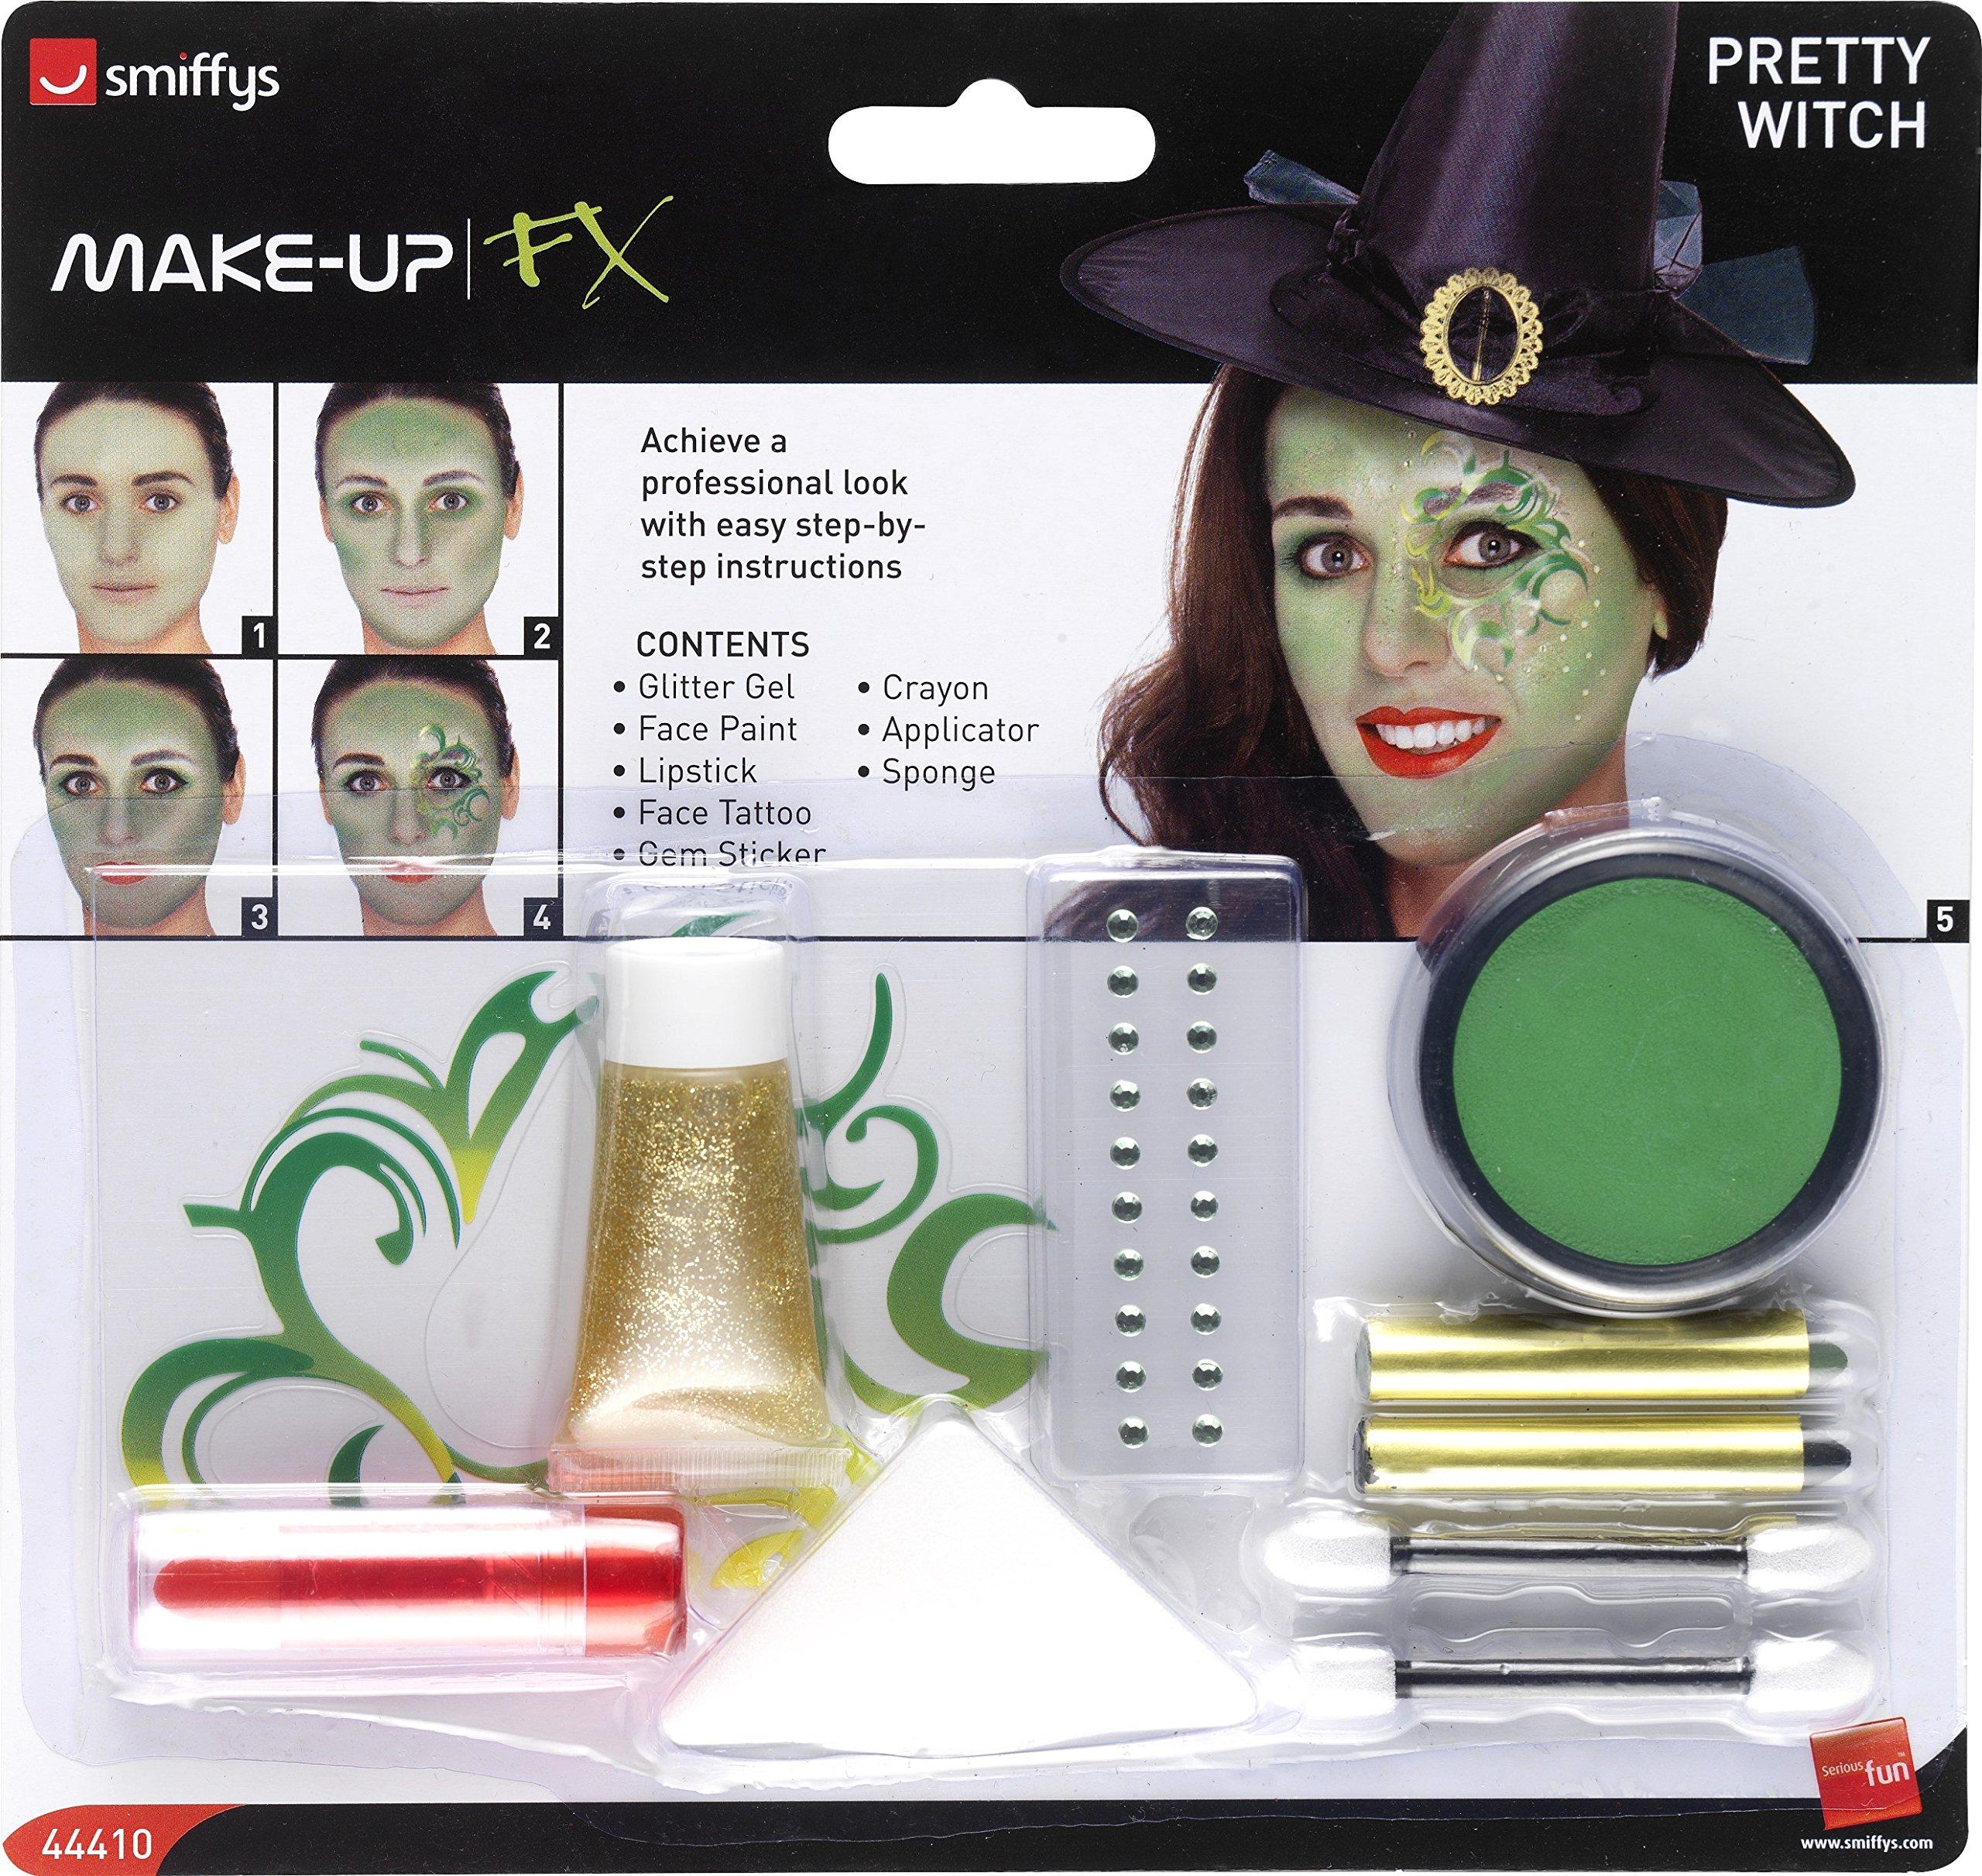 Halloween! Smiffys Hübsche Hexe Make-Up Set, Aqua, Tattoo, Schmuckstein Aufklebern, Lippenstift, Glittergel…